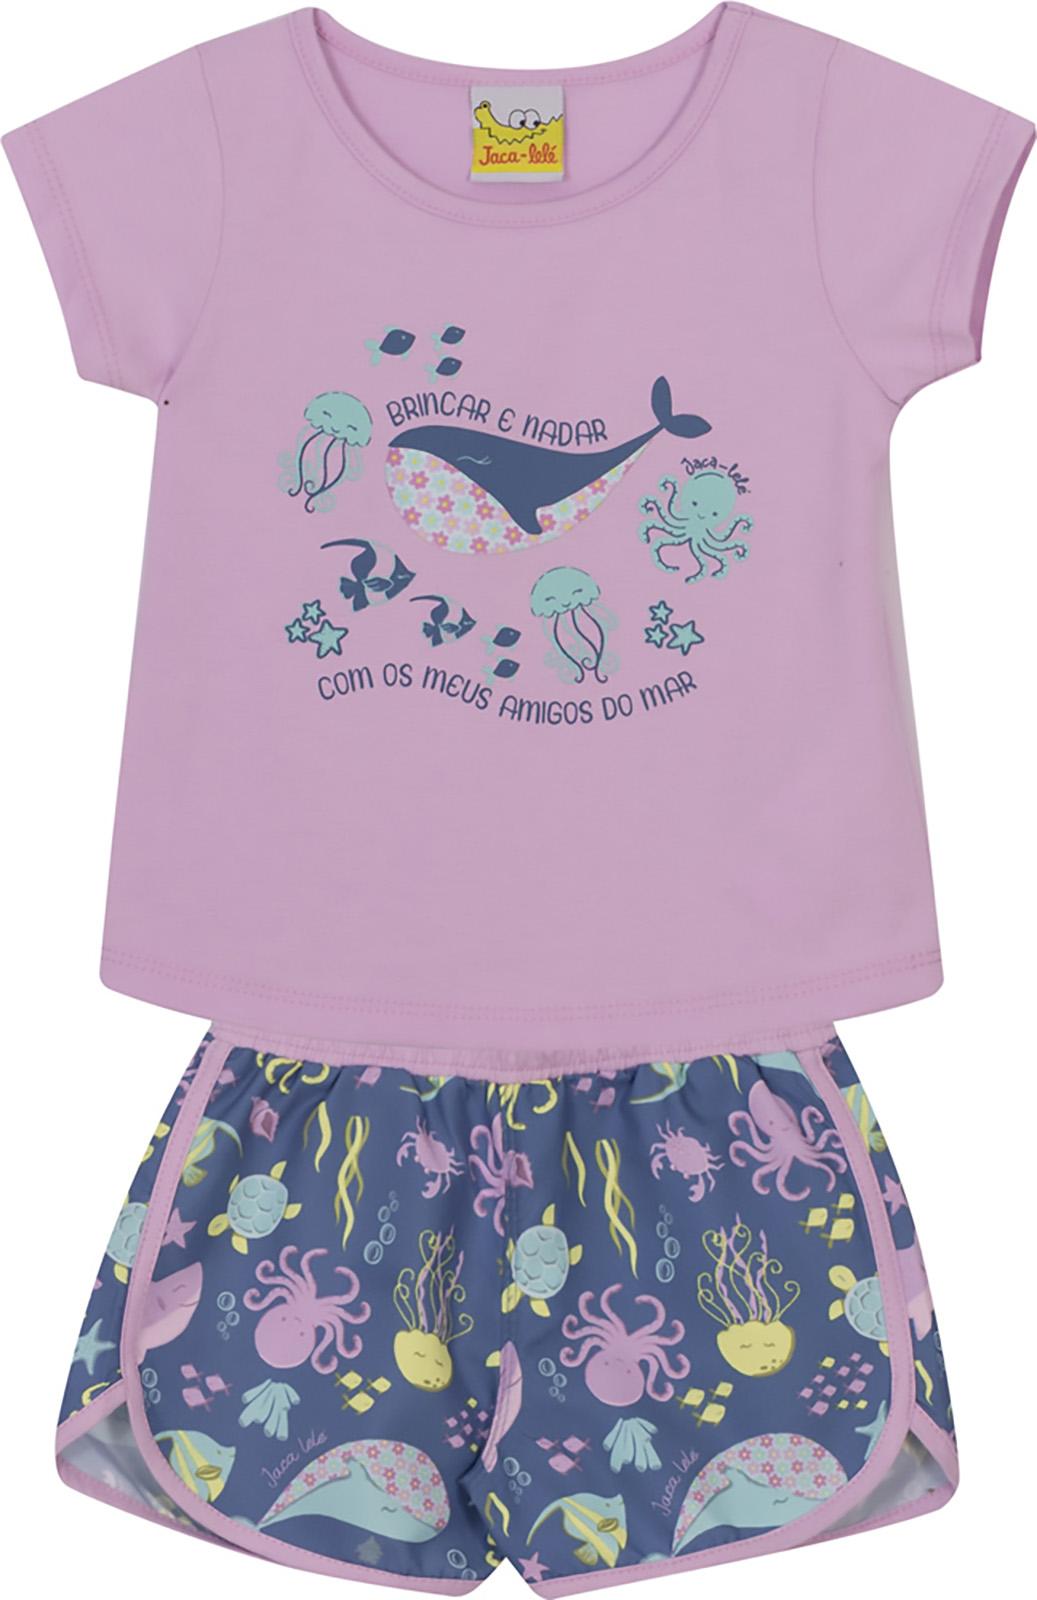 Conjunto Infantil Blusa e Shorts JACA-LELÉ  Baleia Lilás e Azul